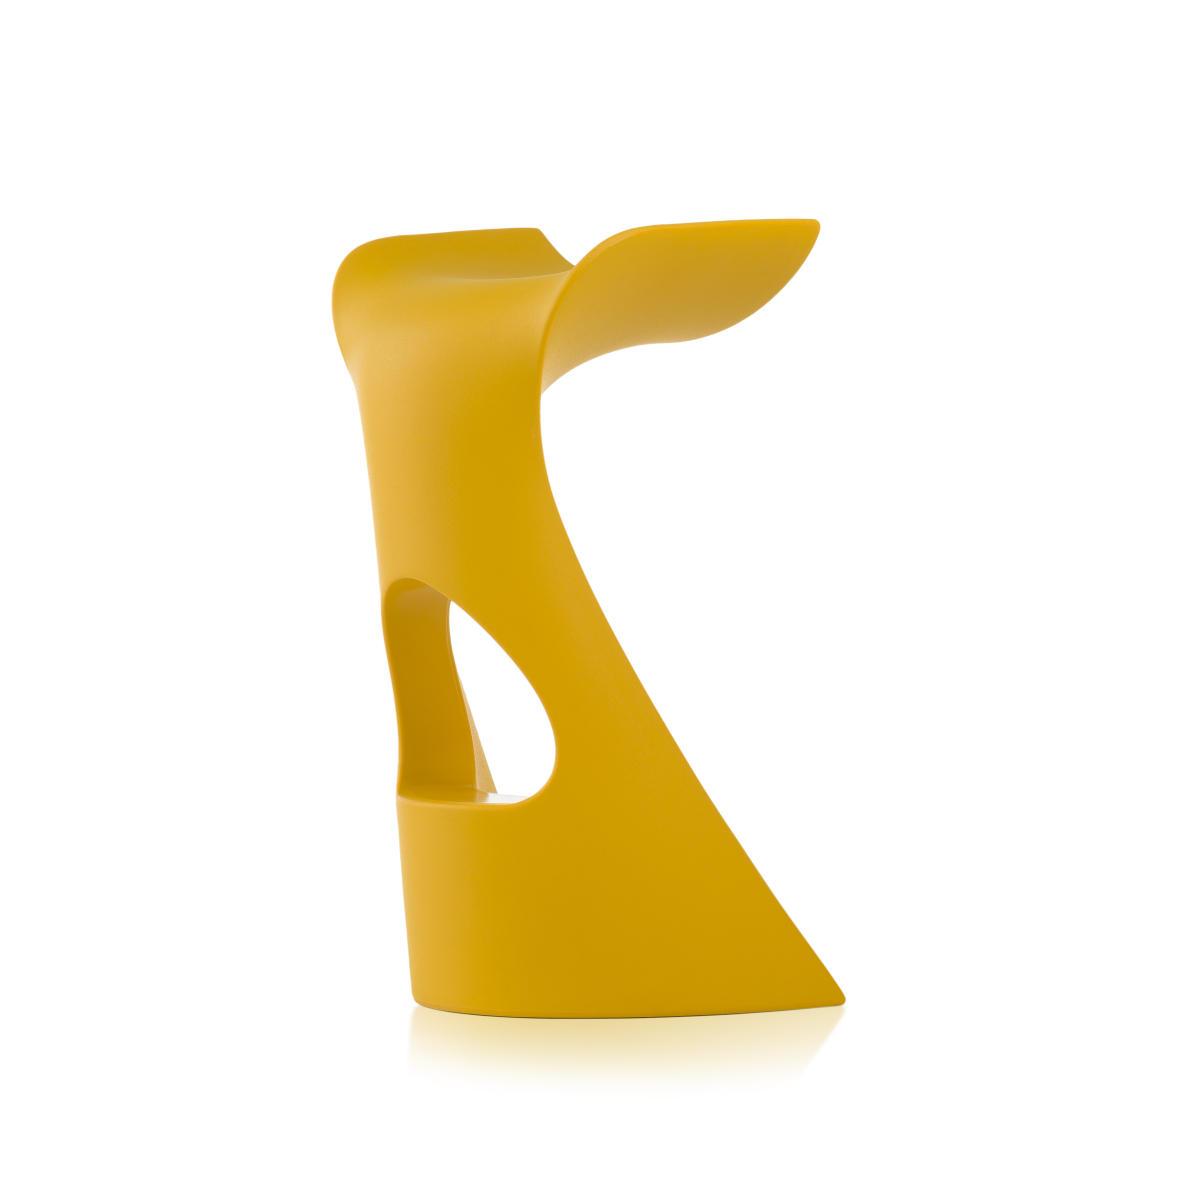 KONCORD Barhocker von Karim Rashid saffron yellow